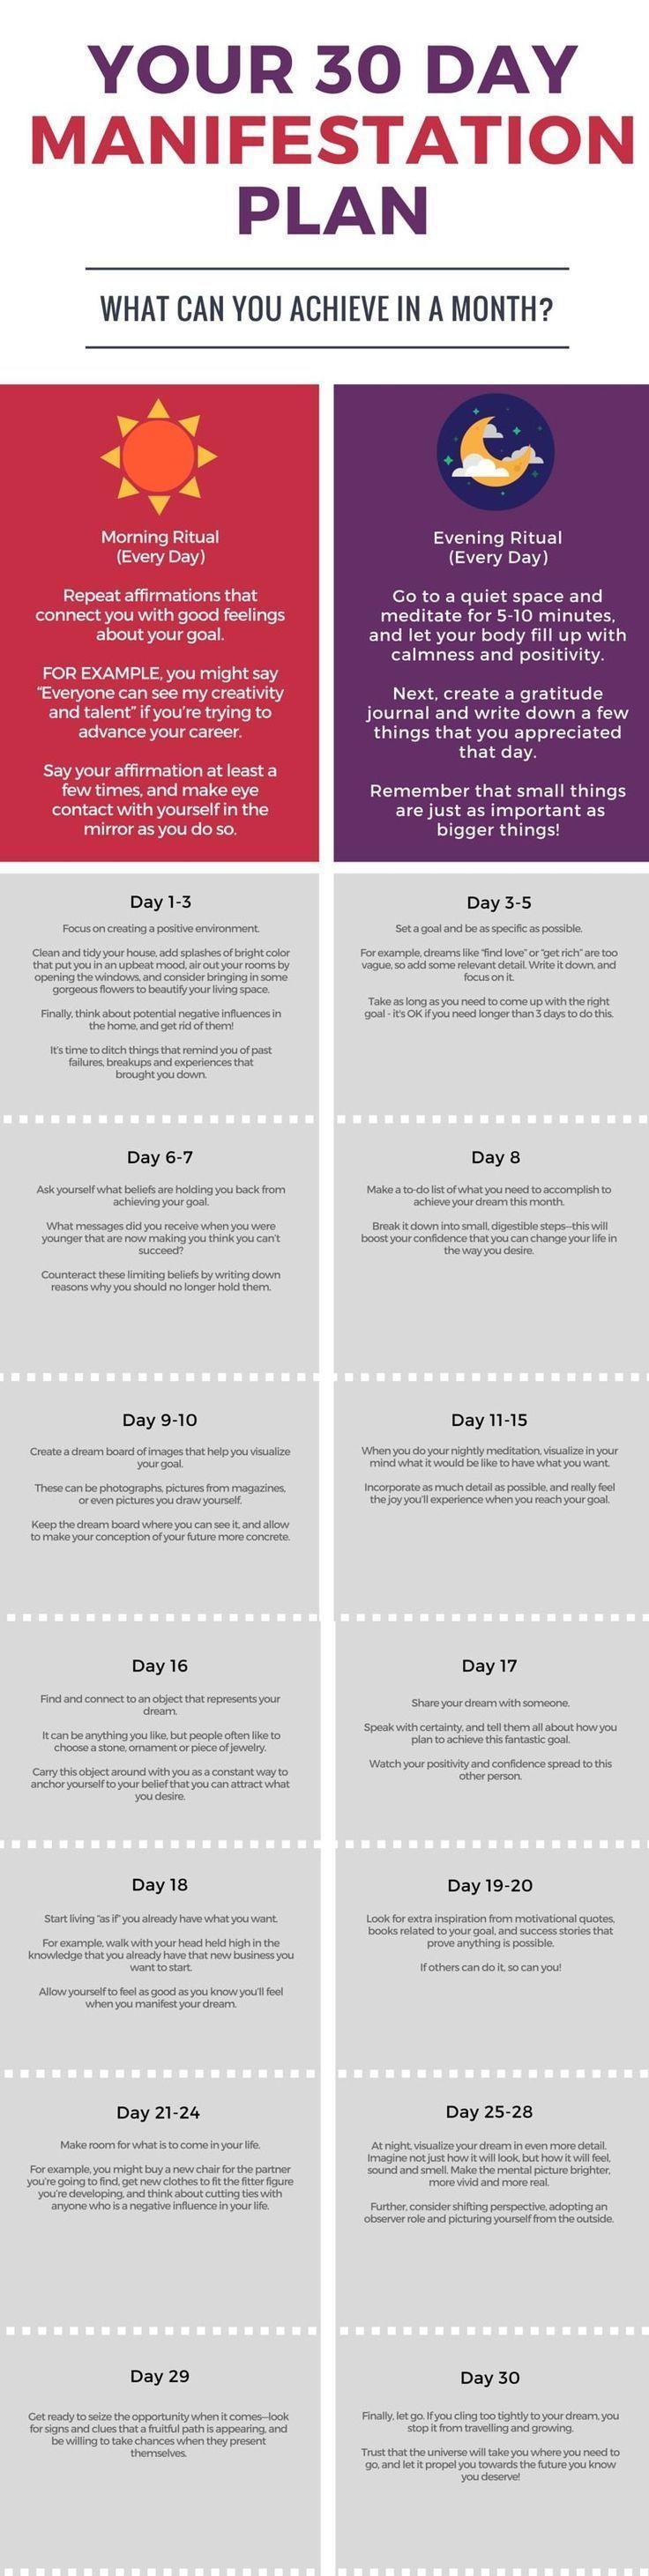 ✿ #numerology Based on BirthDay, Birth Date ✿ #numerologychart